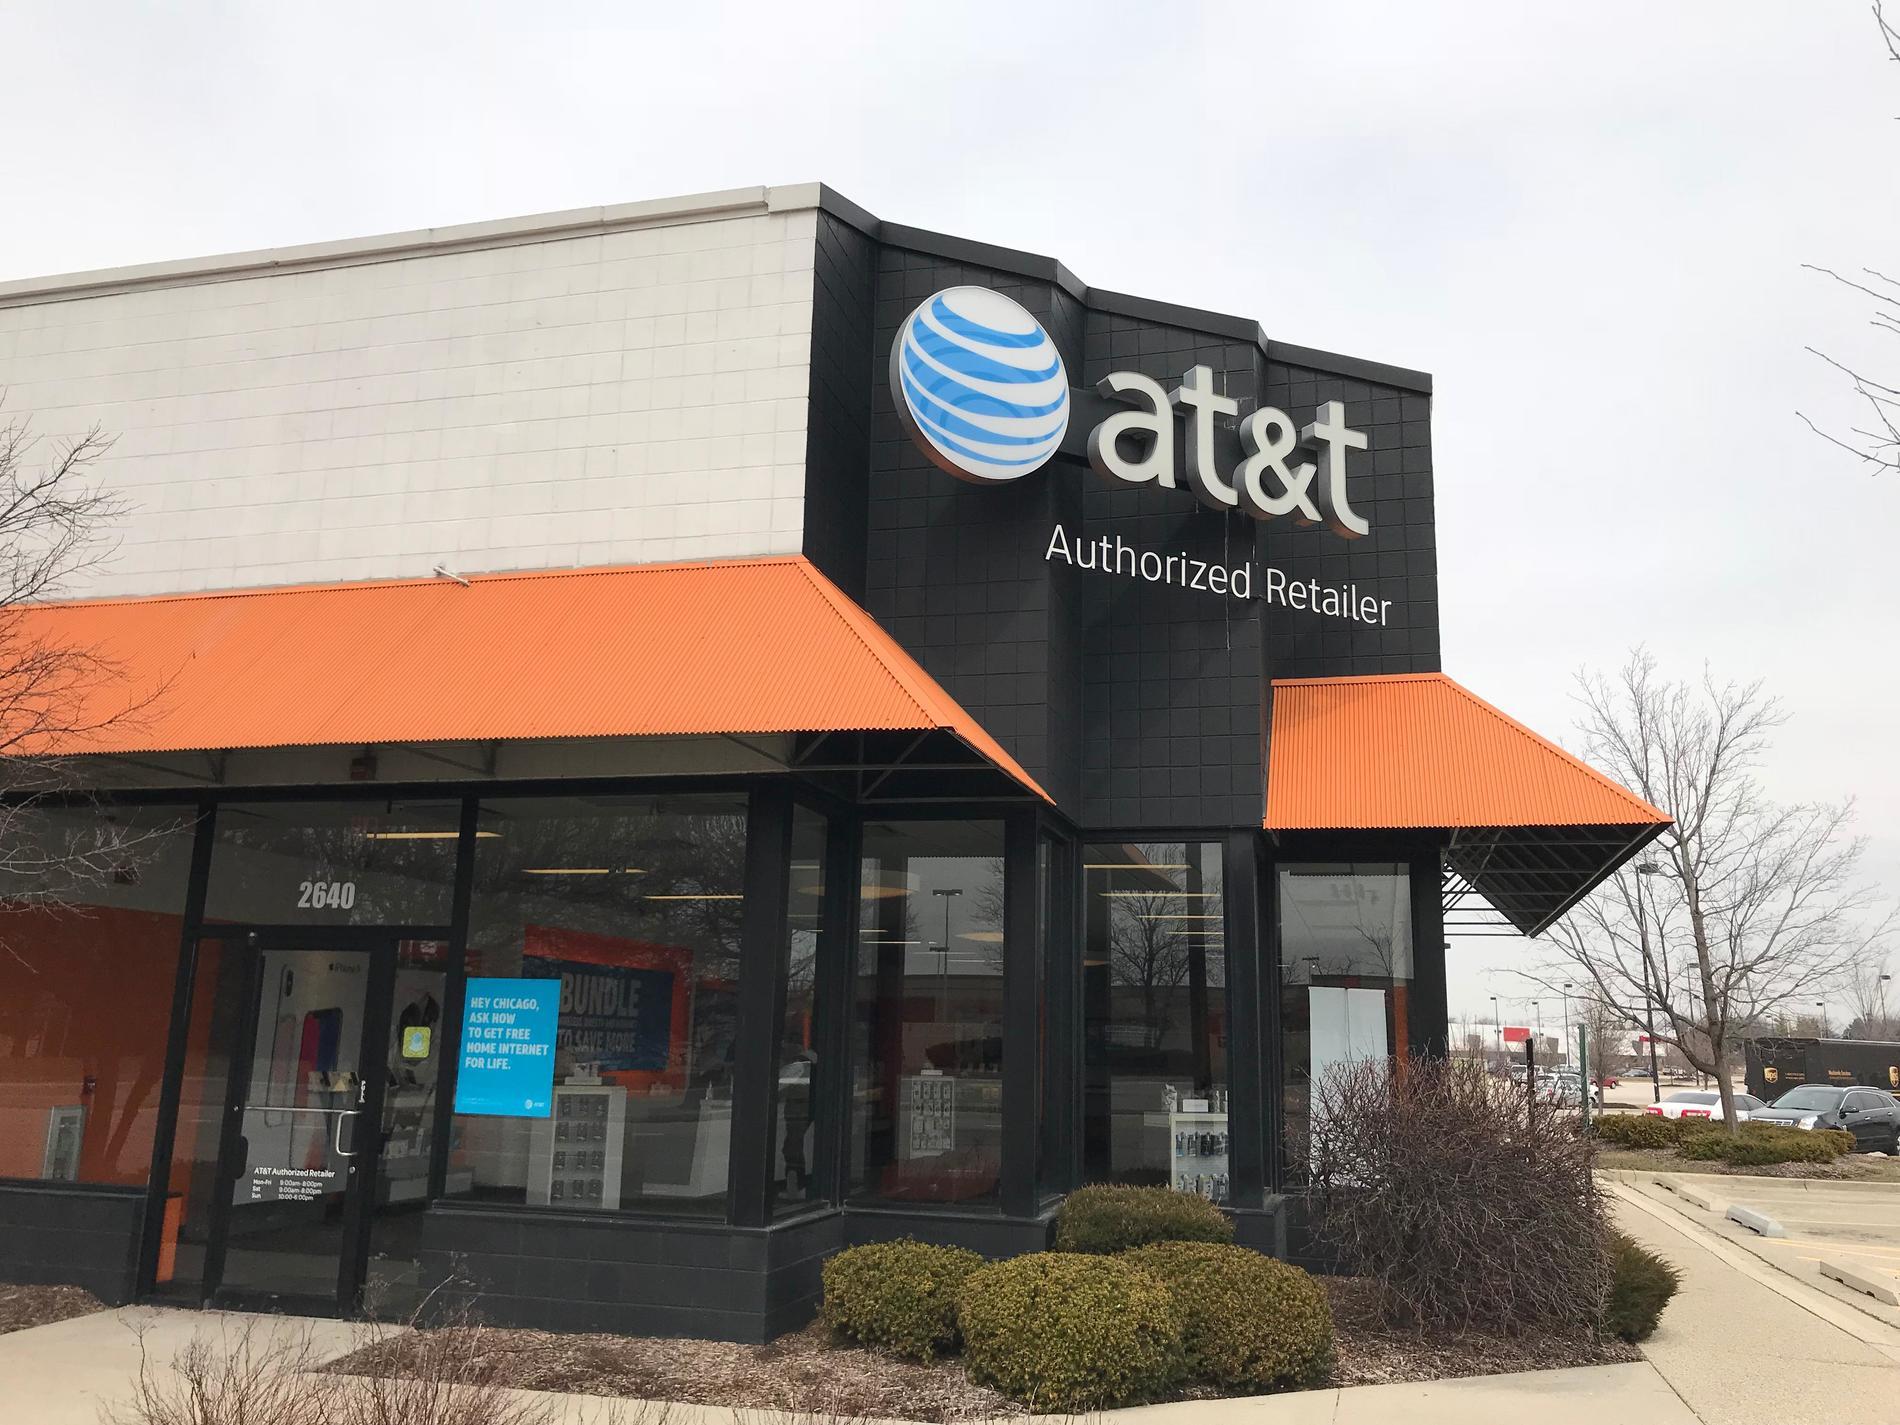 AT&T Store: 2640 W Schaumburg Rd Schaumburg, IL | AT&T Experience